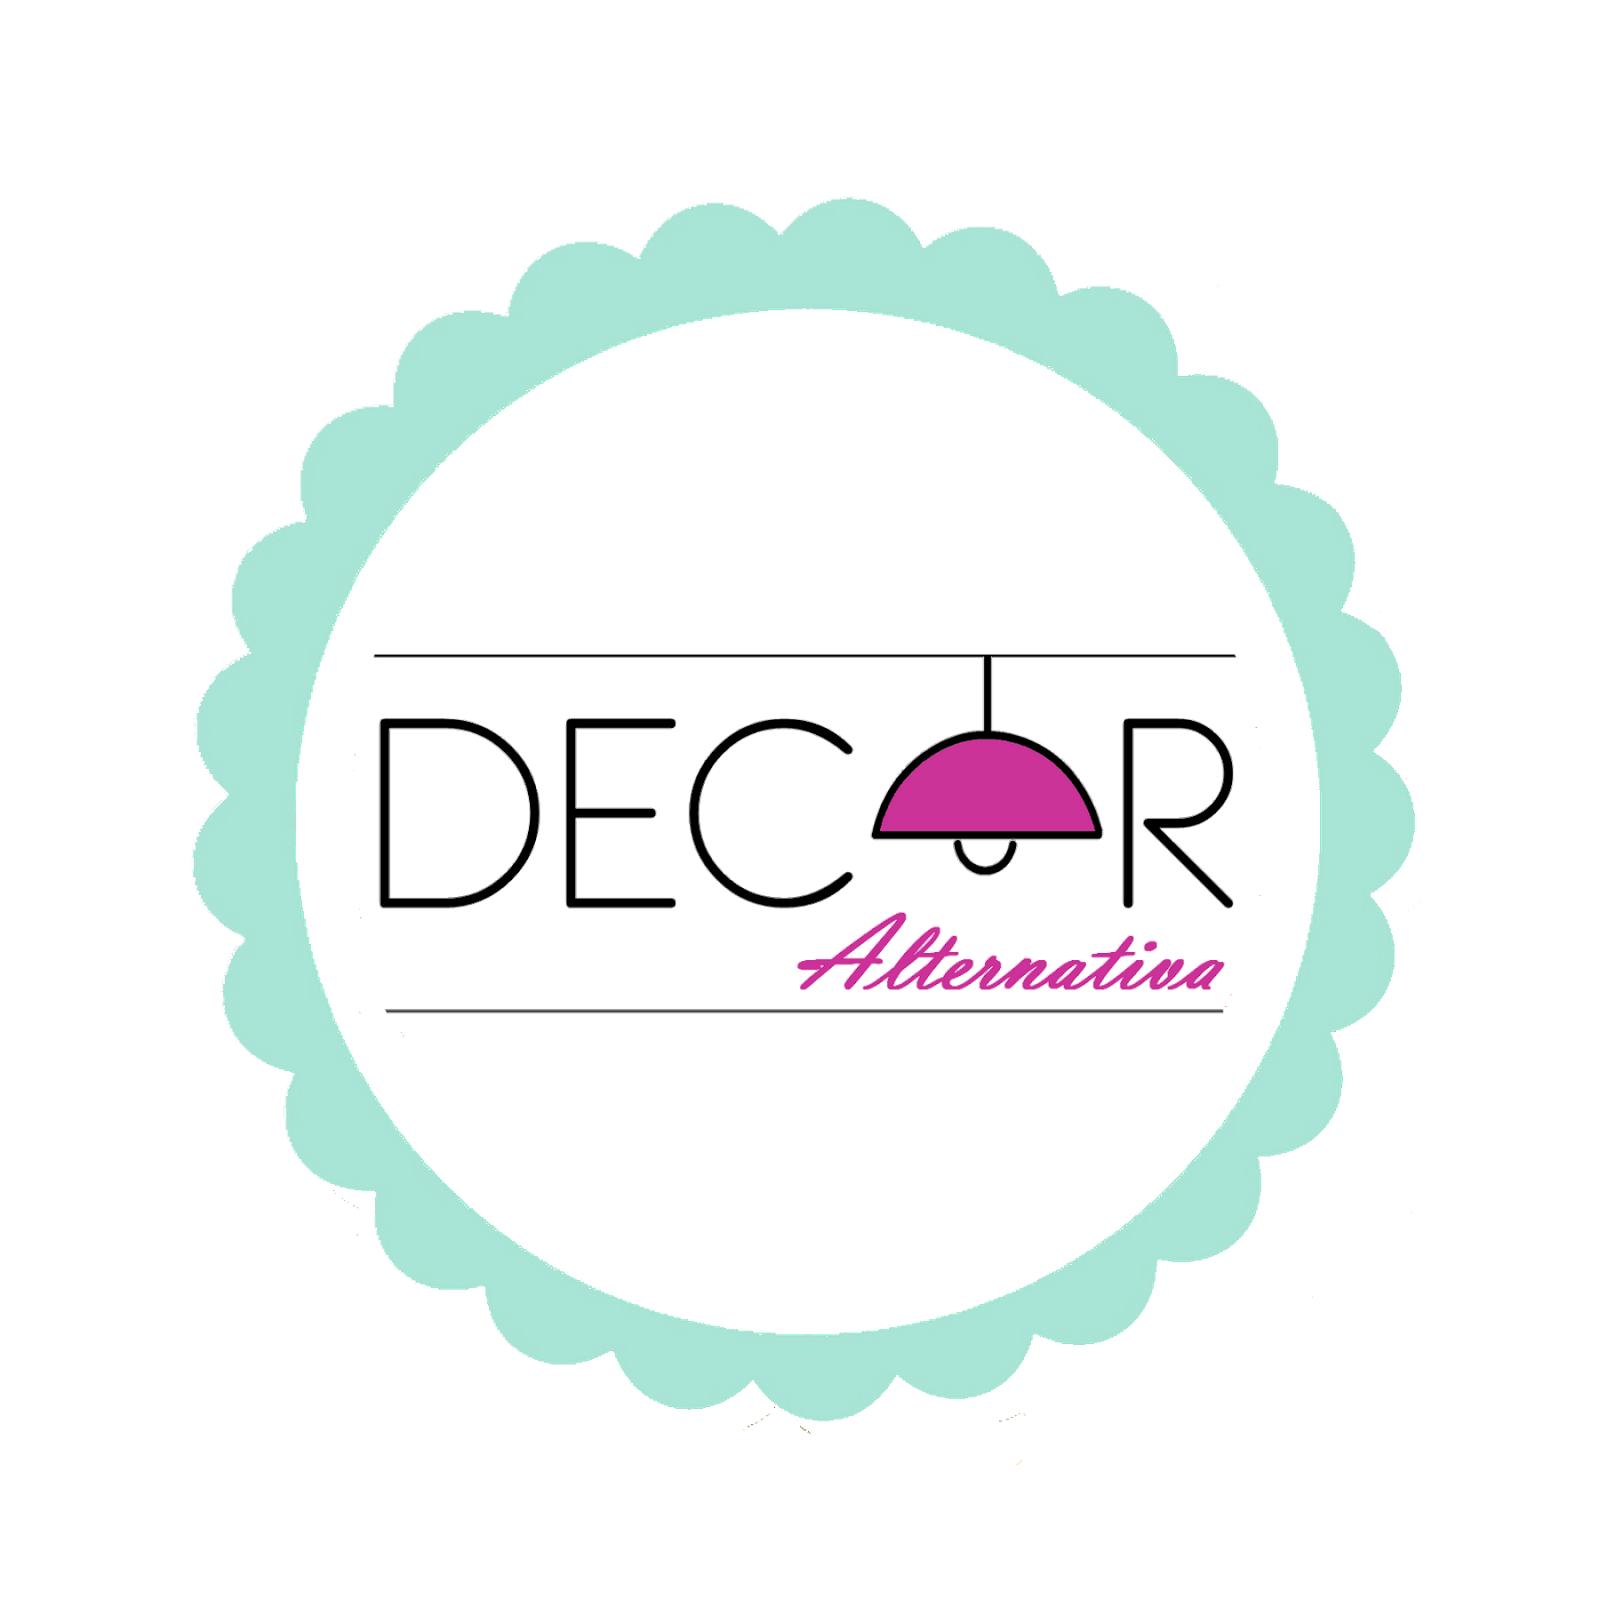 decoralternativa.com.br